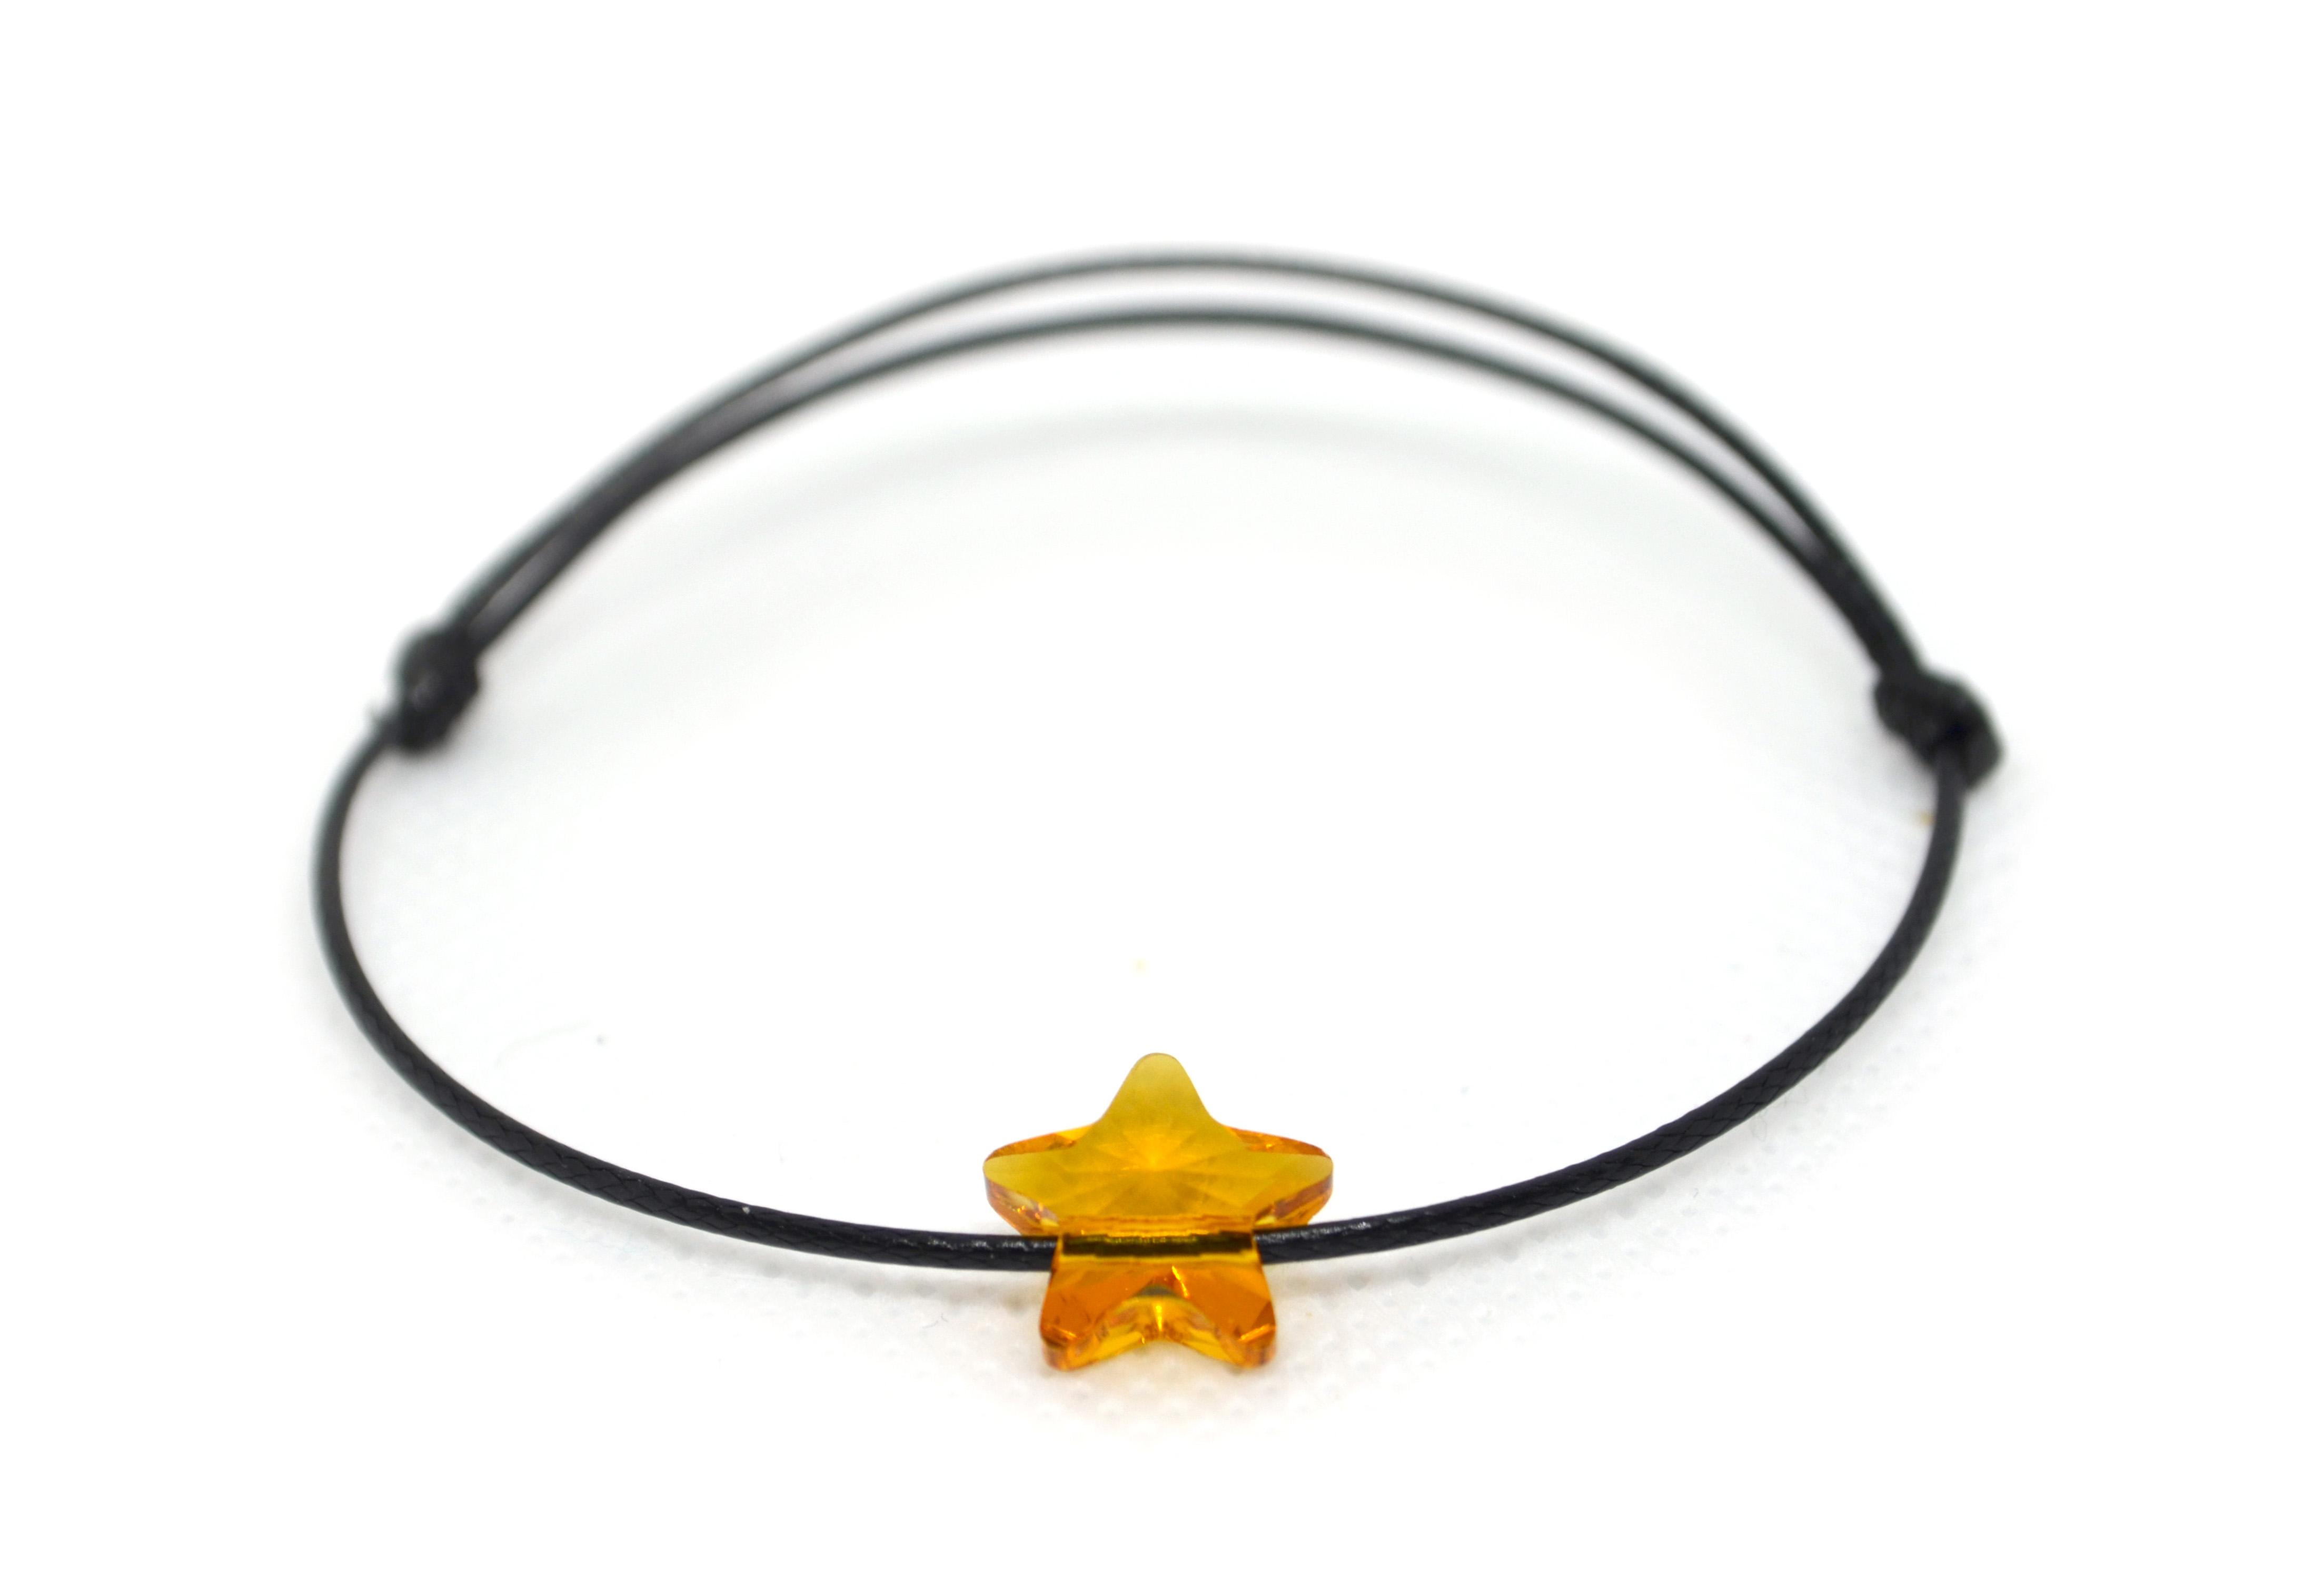 Šňůkový náramek oranžová hvězdička SWAROVSKI Černá šňůrka, Dámský náramek